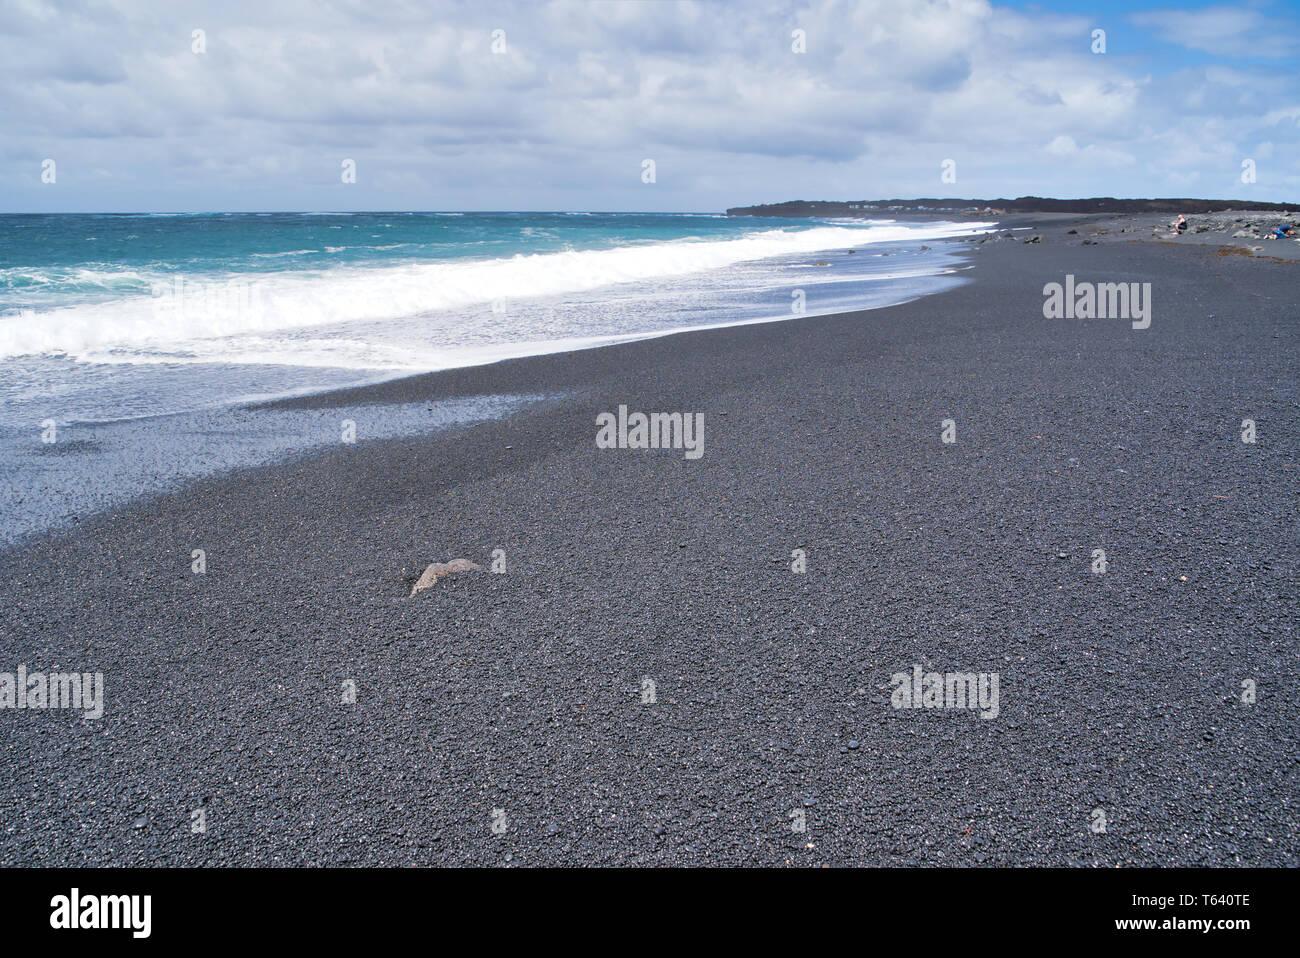 Janubio beach in Lanzarote, Spain Stock Photo